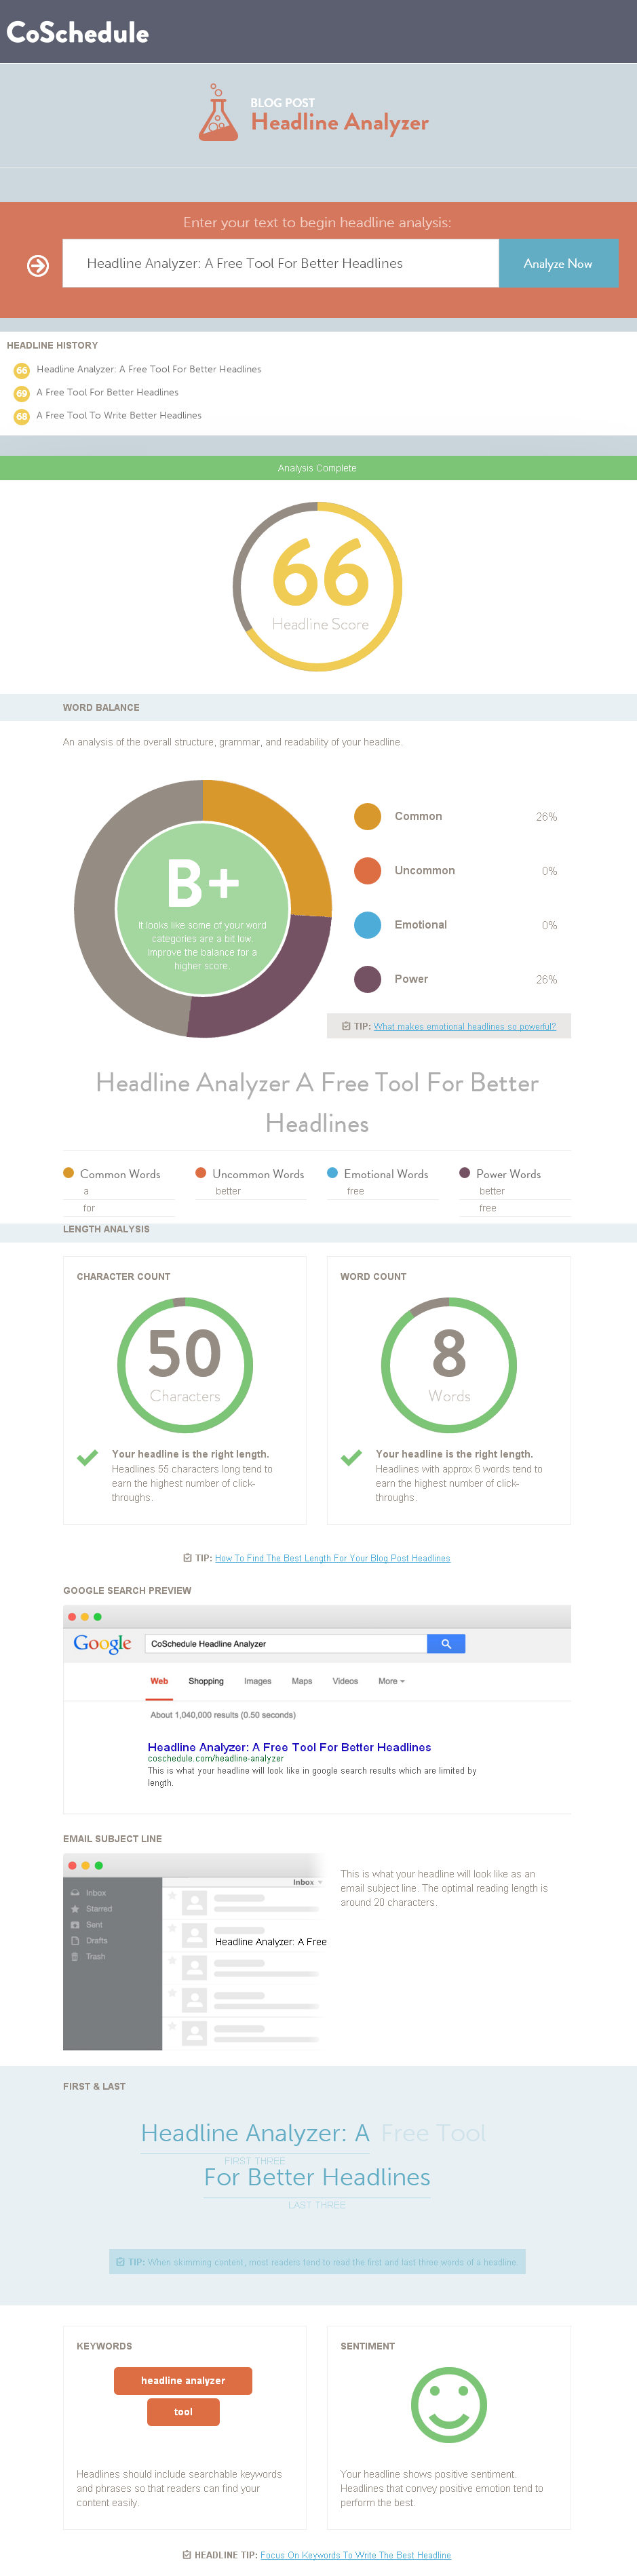 Headline Analyzer: A Free Tool For Better Headlines